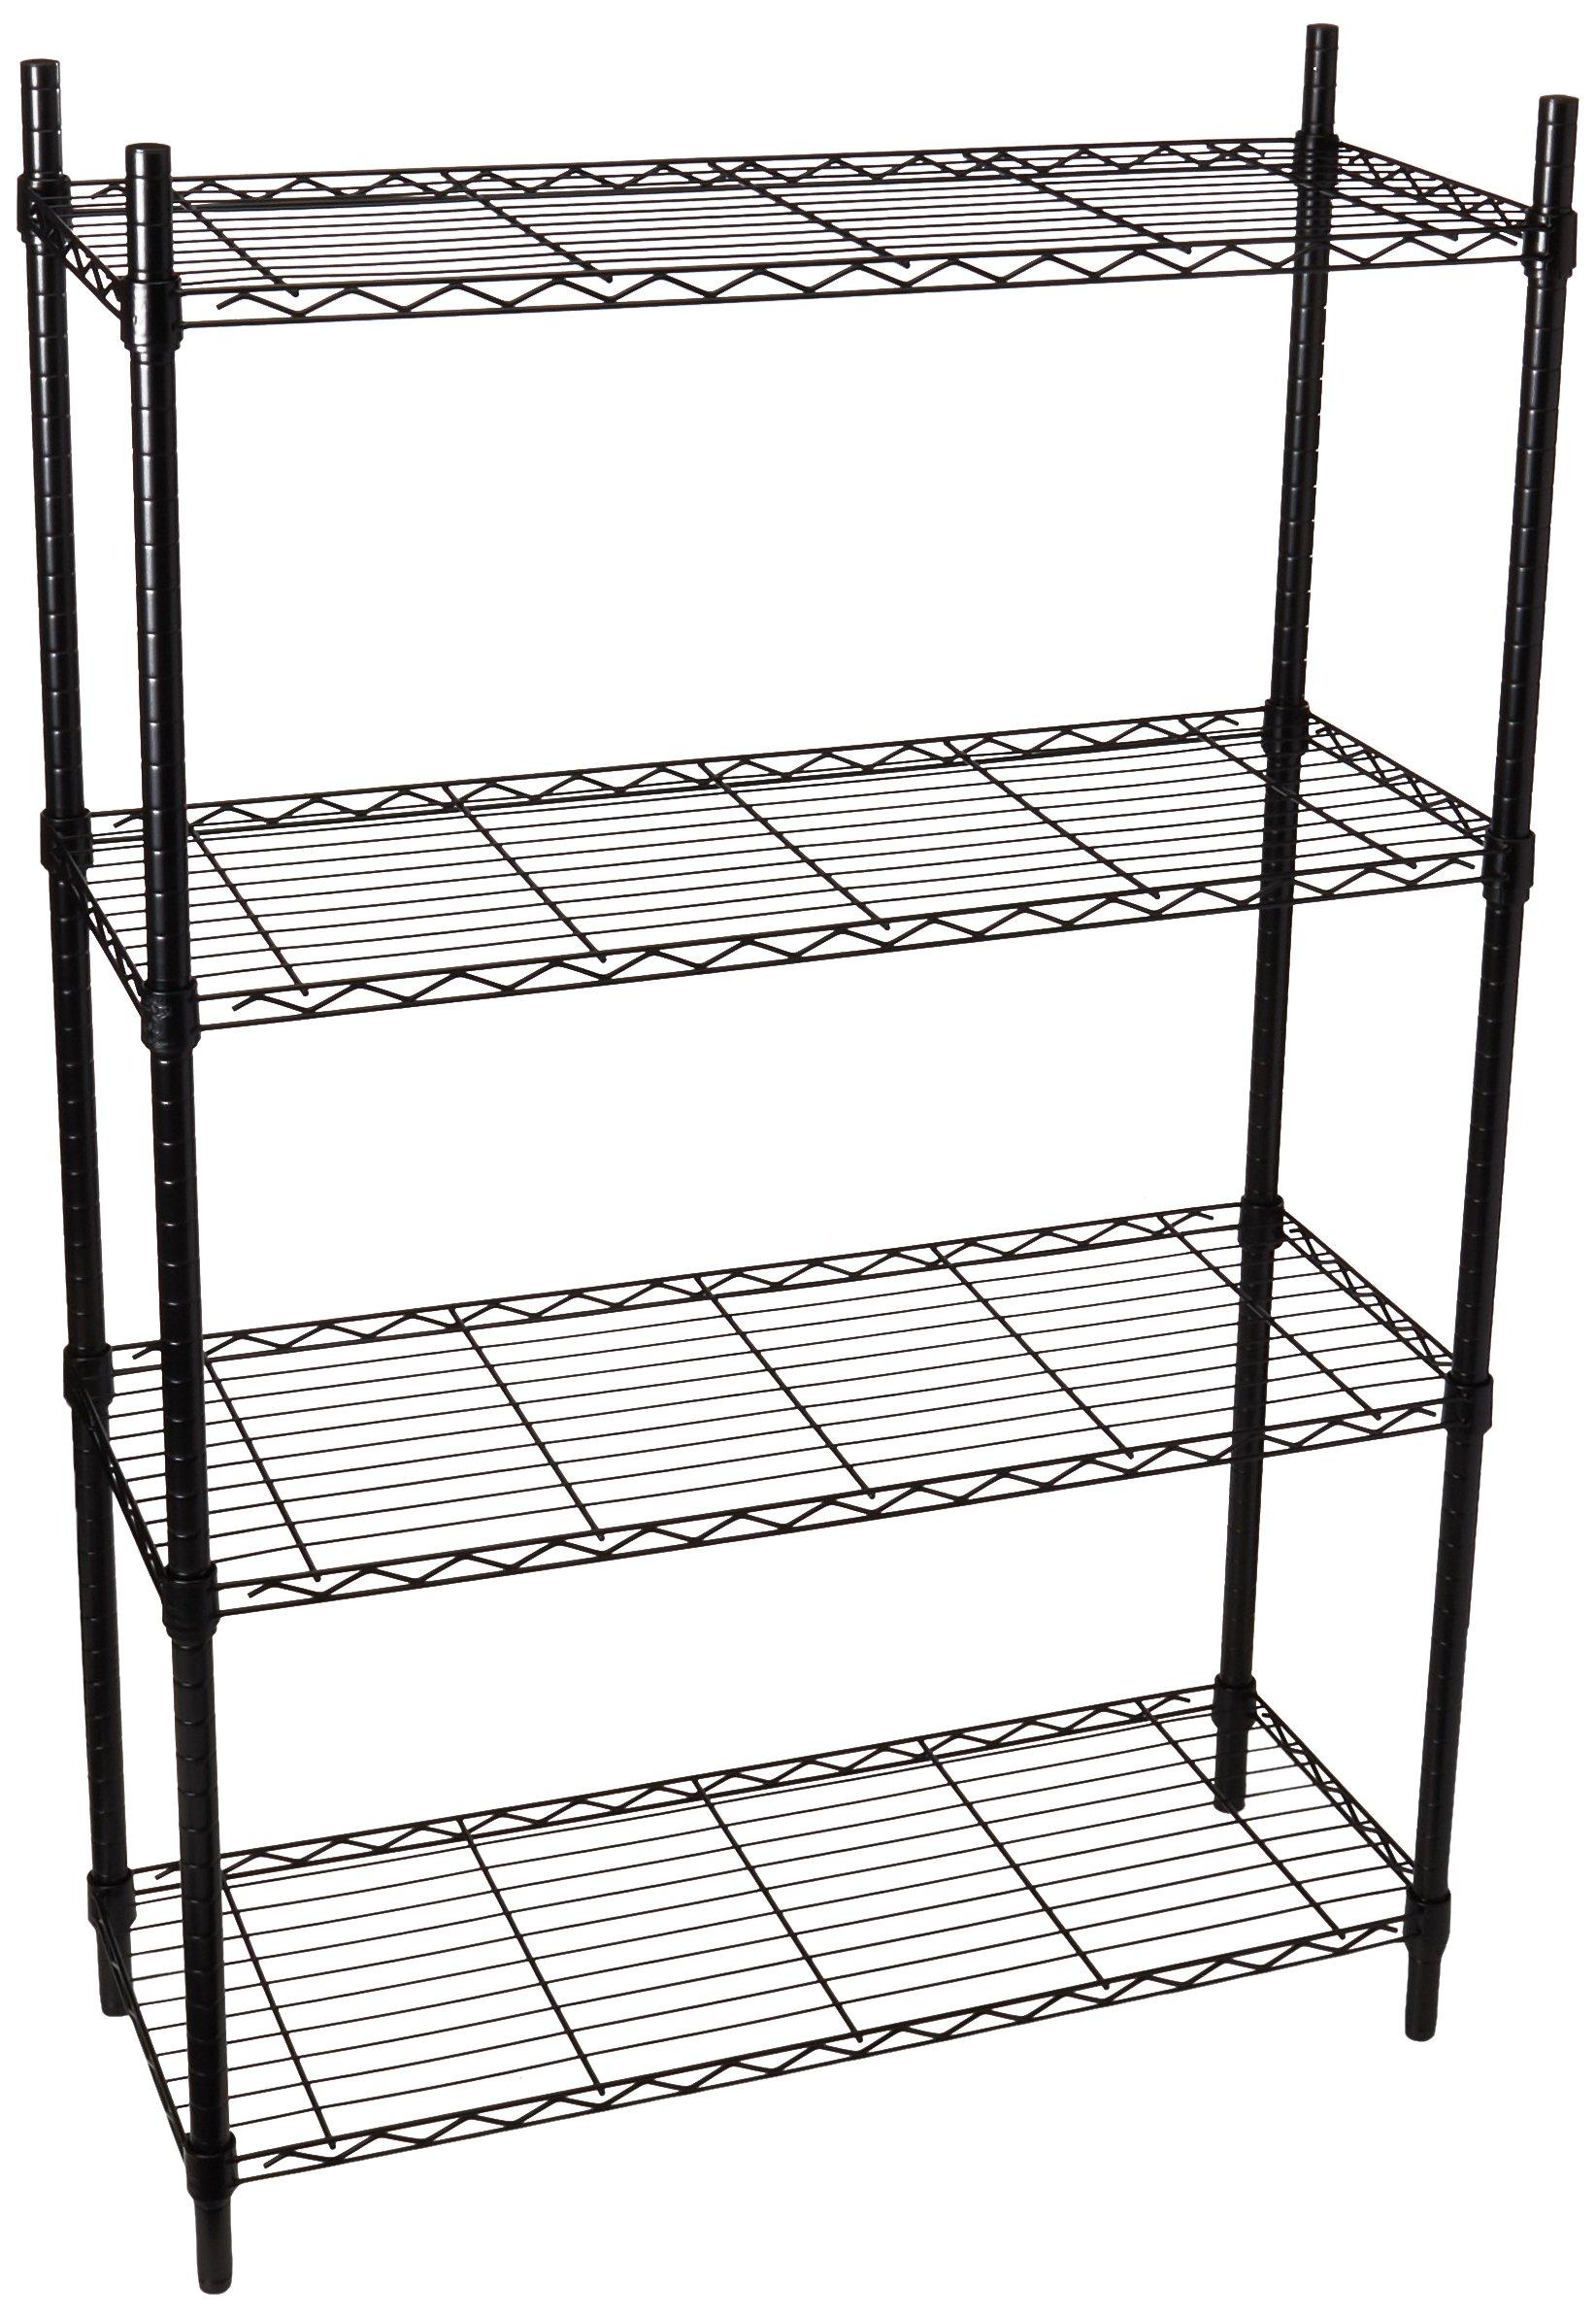 Honey-Can-Do SHF-01908 Adjustable Storage Shelving Unit, 250-Pounds Per Shelf, Black, 4-Tier, 36Lx14Wx54H by Honey-Can-Do